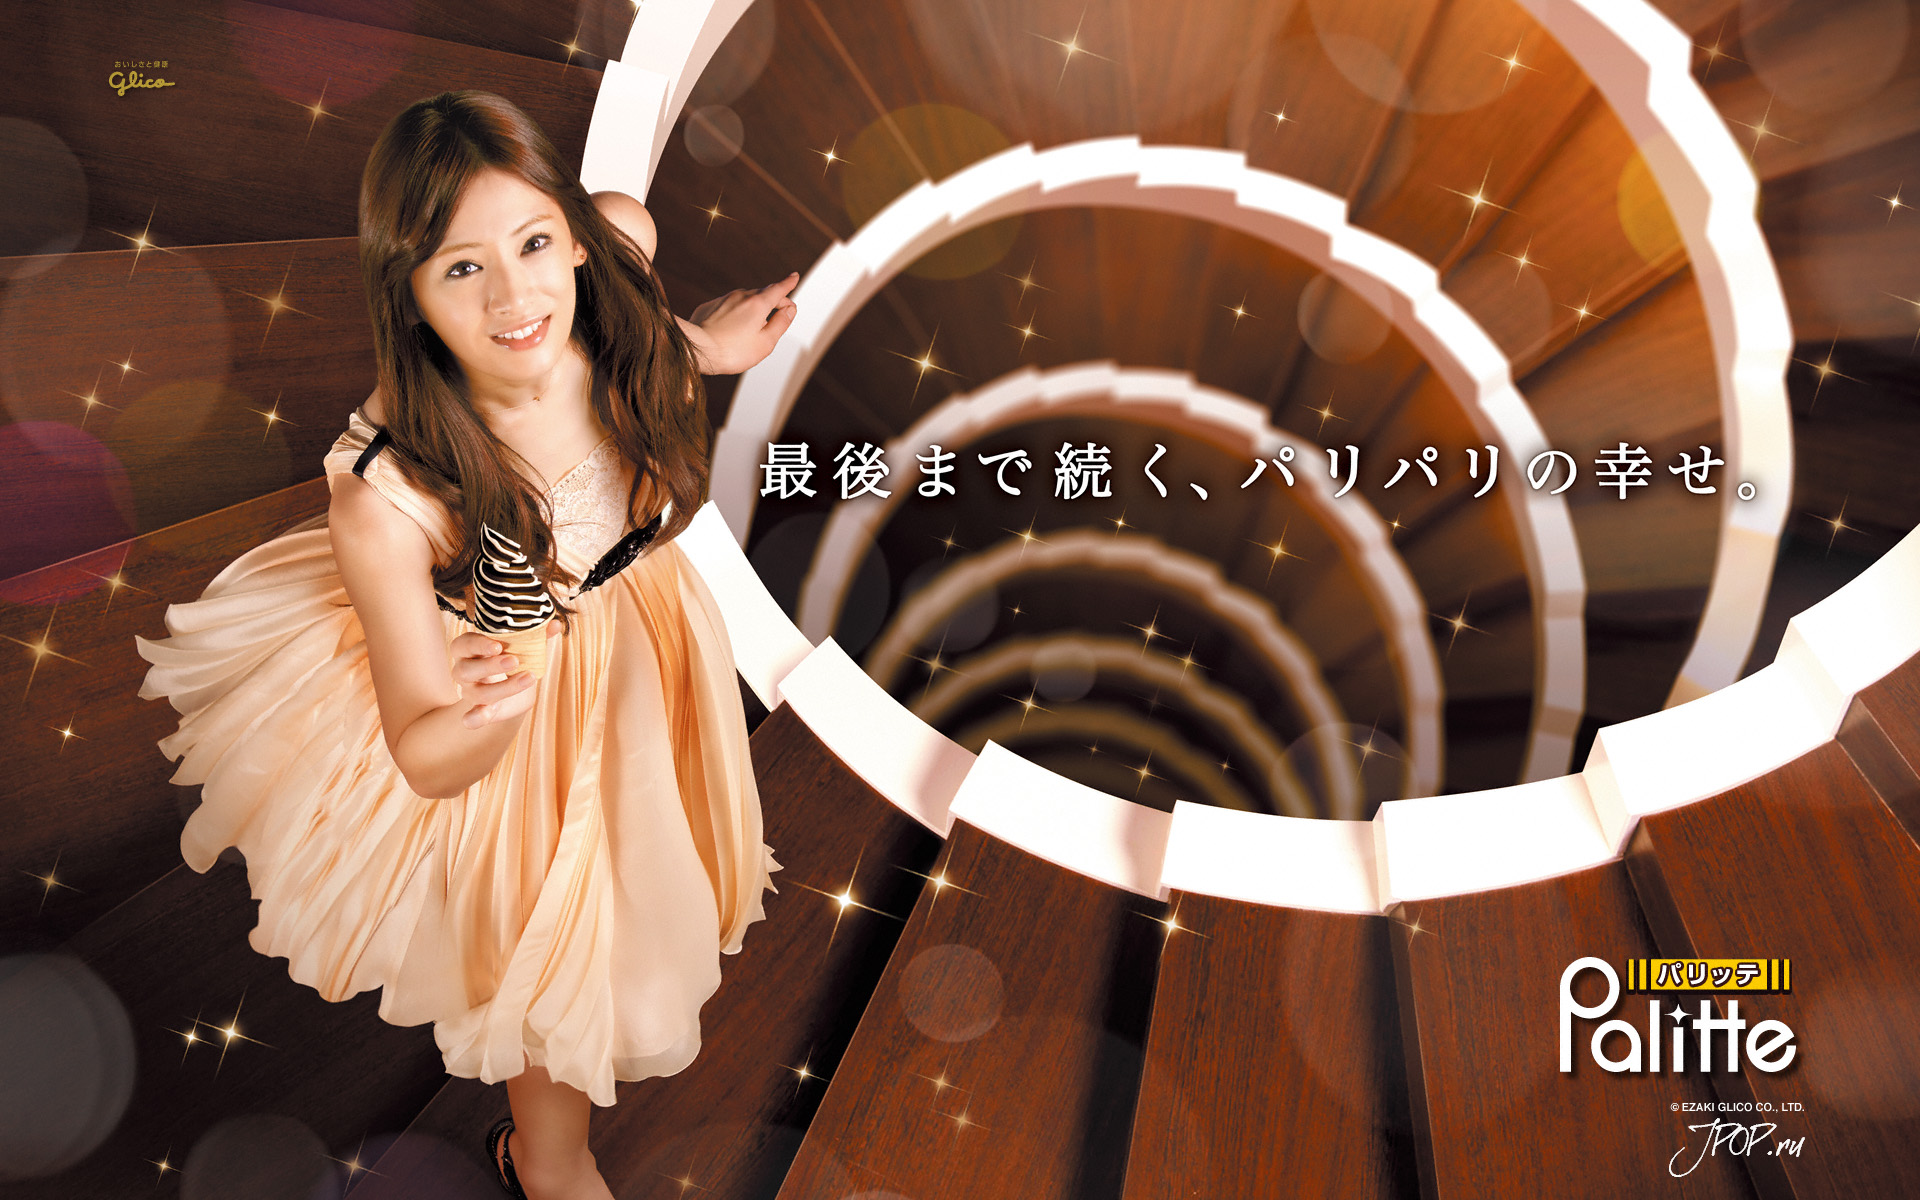 Keiko Kitagawa, Glico Palitte, ice cream [PH201025023427]